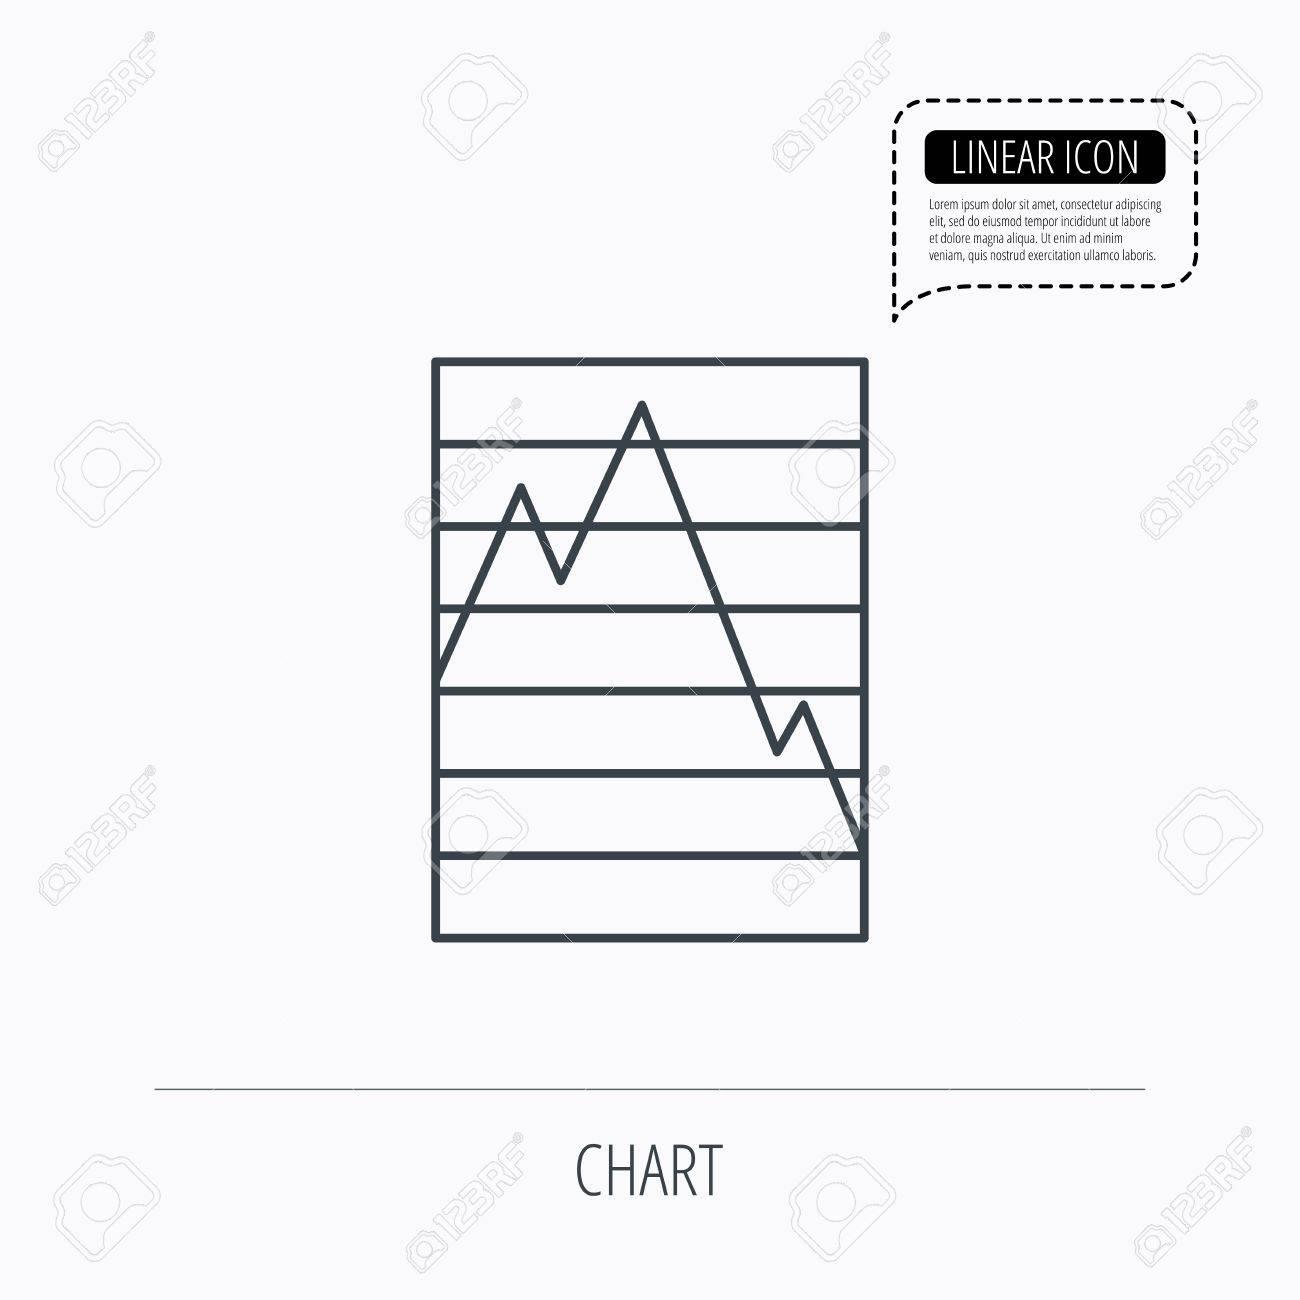 Chart curve icon graph diagram sign demand reduction symbol chart curve icon graph diagram sign demand reduction symbol linear outline icon ccuart Choice Image